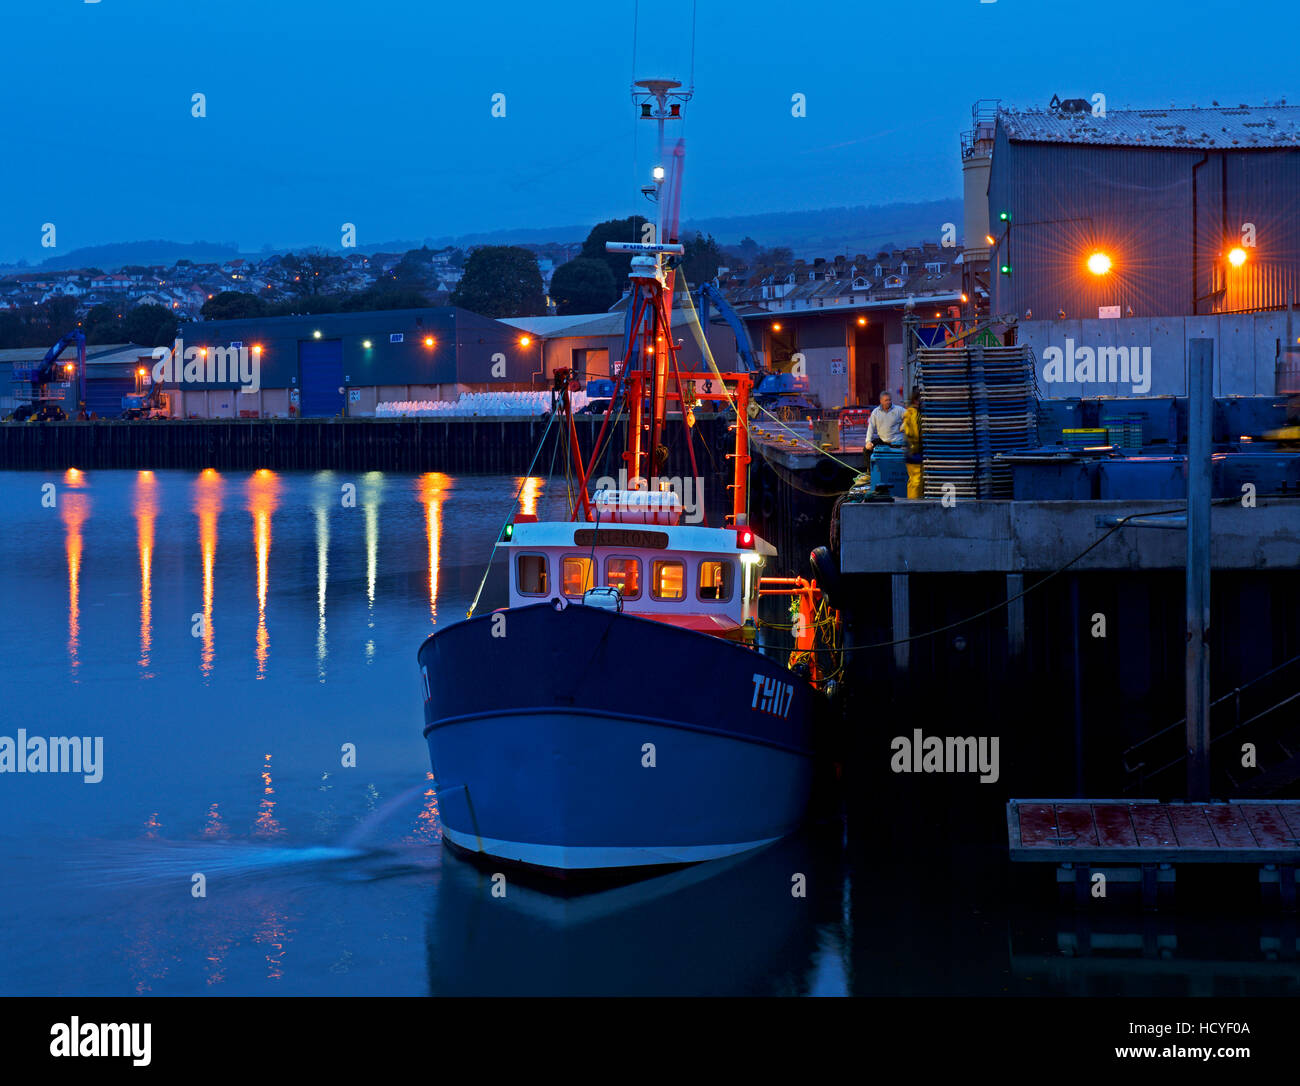 Descarga arrastrero pescado en la zona de Quayside, Teignmouth, Devon, Inglaterra Foto de stock